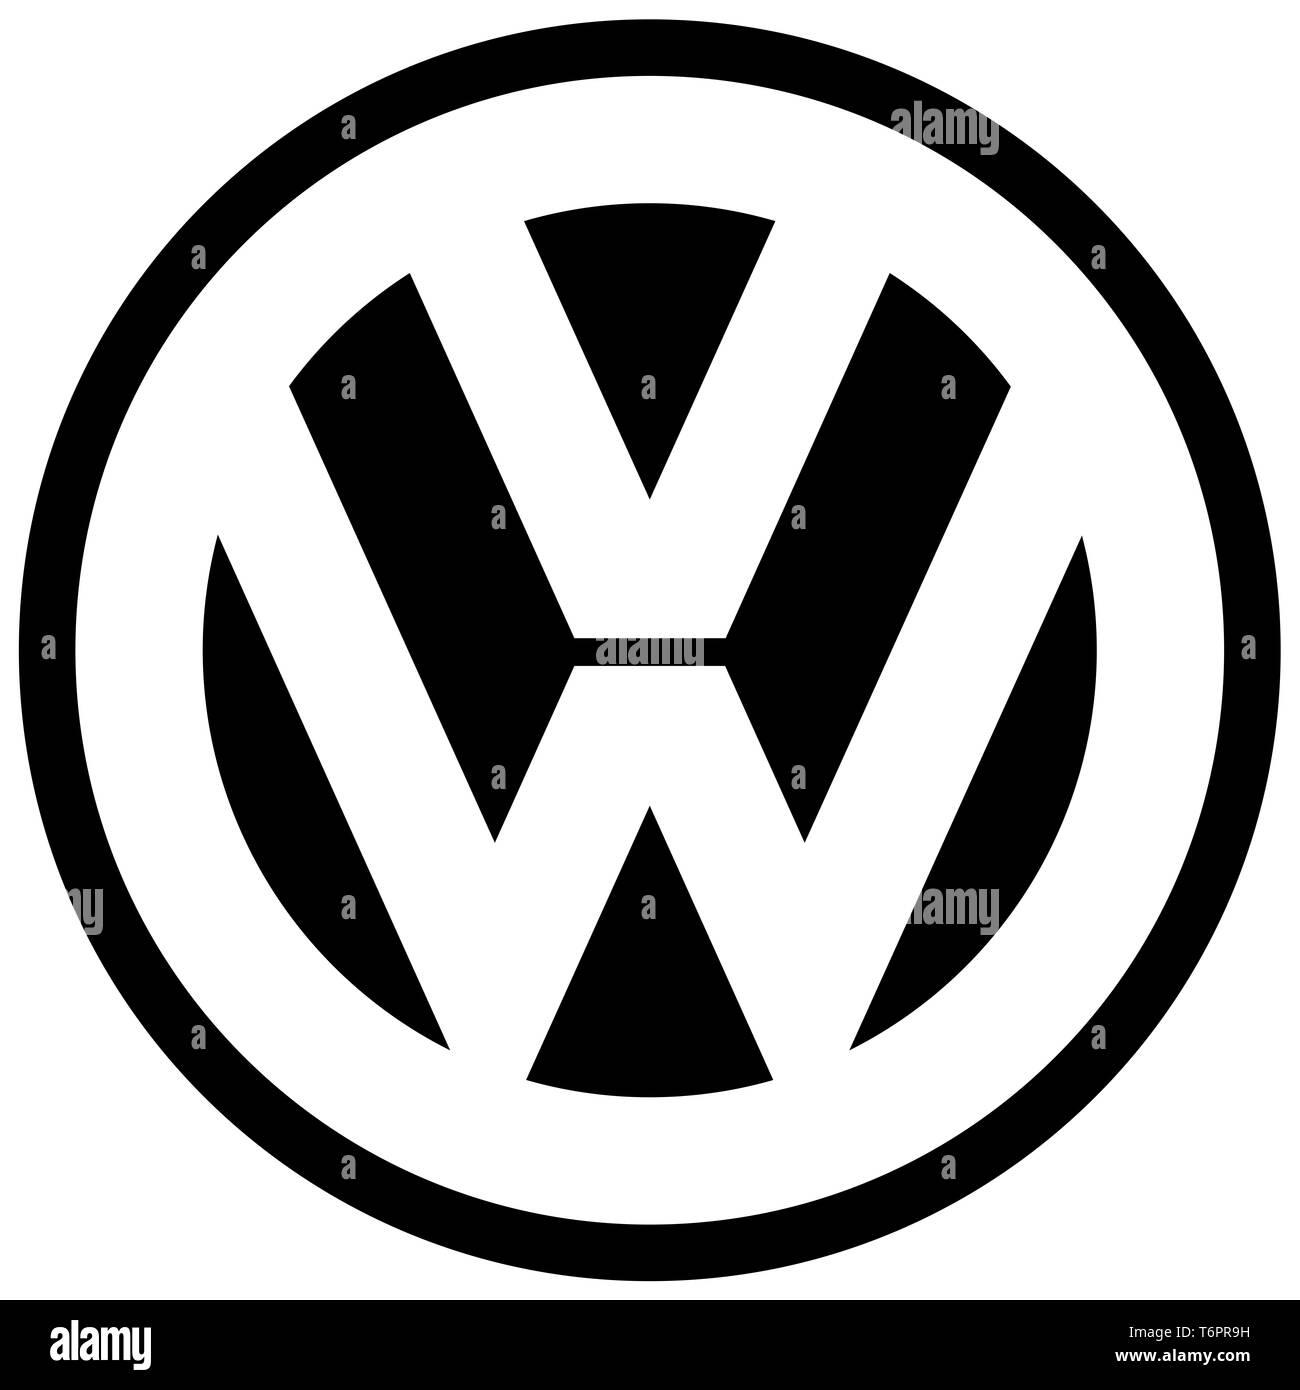 Volkswagen, black VW logo, corporate identity, optional, white background, Germany - Stock Image